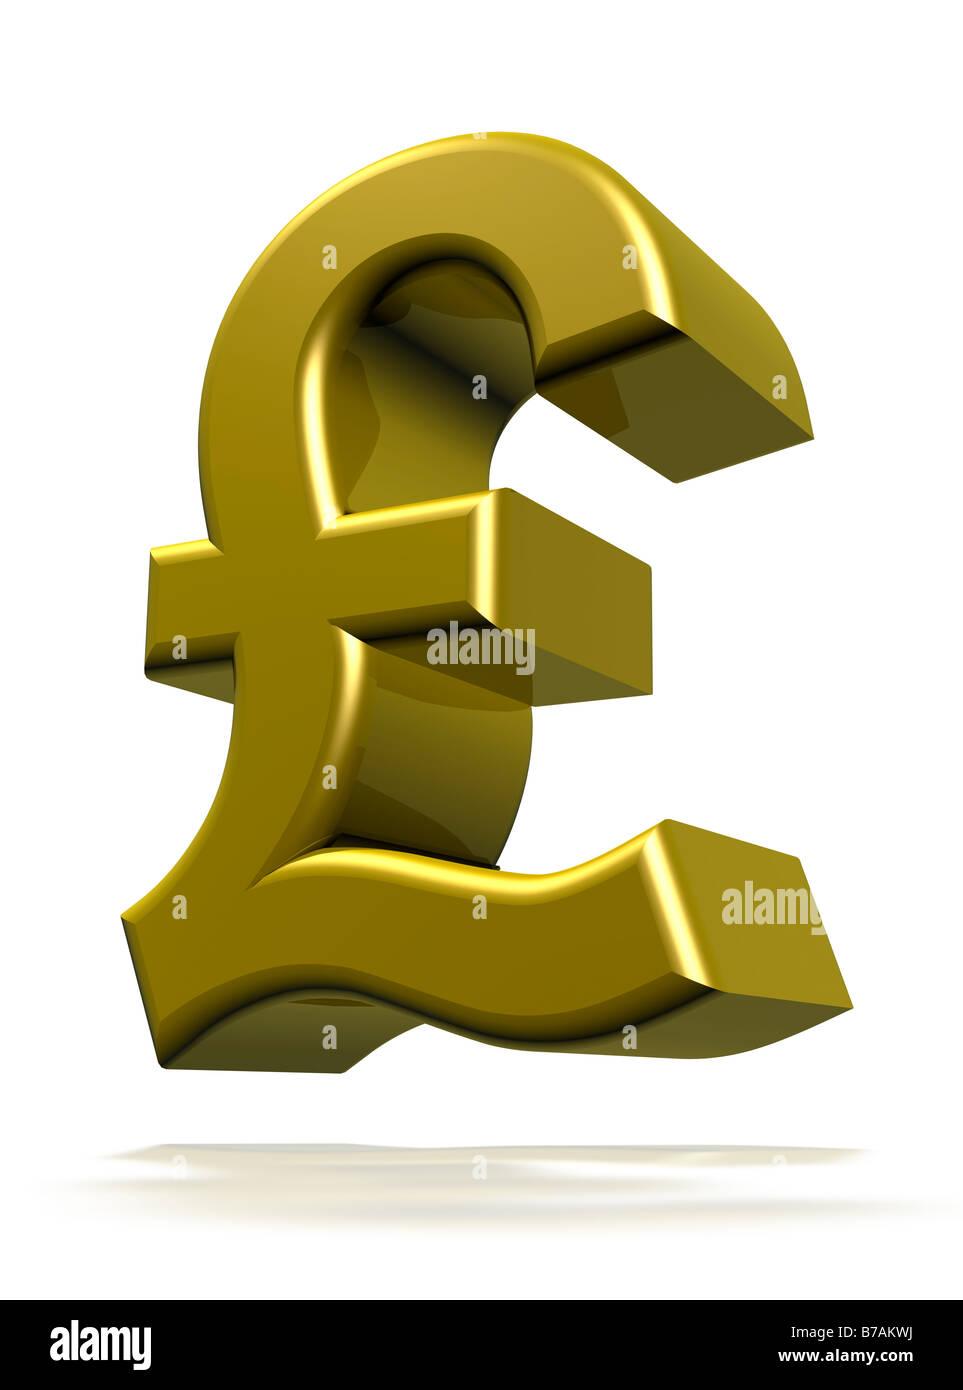 Symbole de la livre sterling de rendu 3D cgi Photo Stock